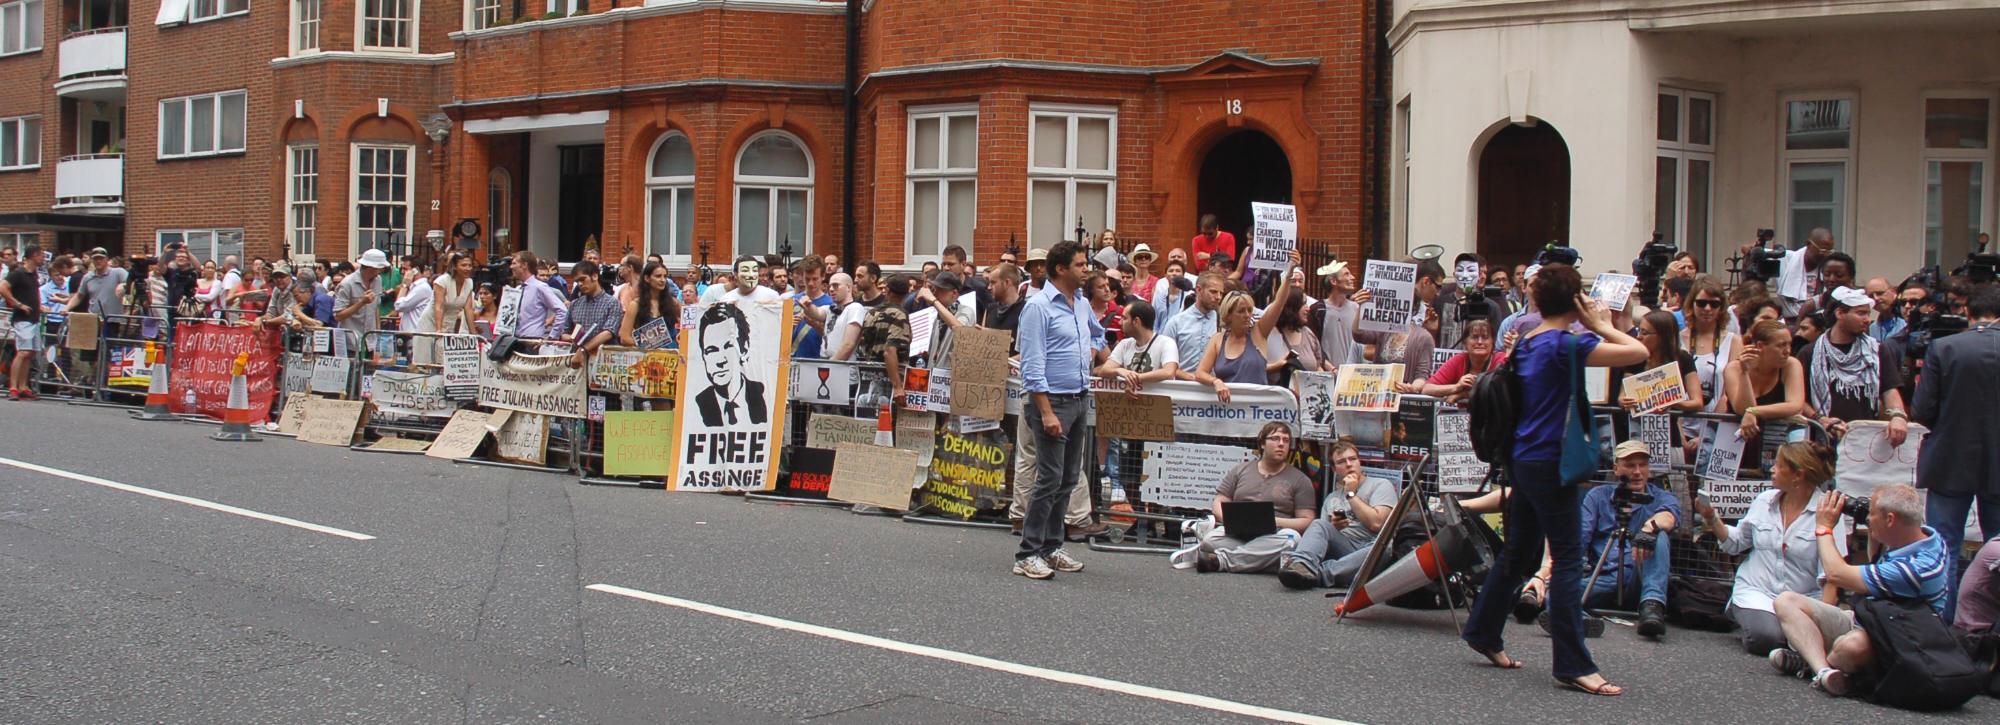 est100 一些攝影(some photos): Julian Assange 亞桑傑/ 阿桑奇